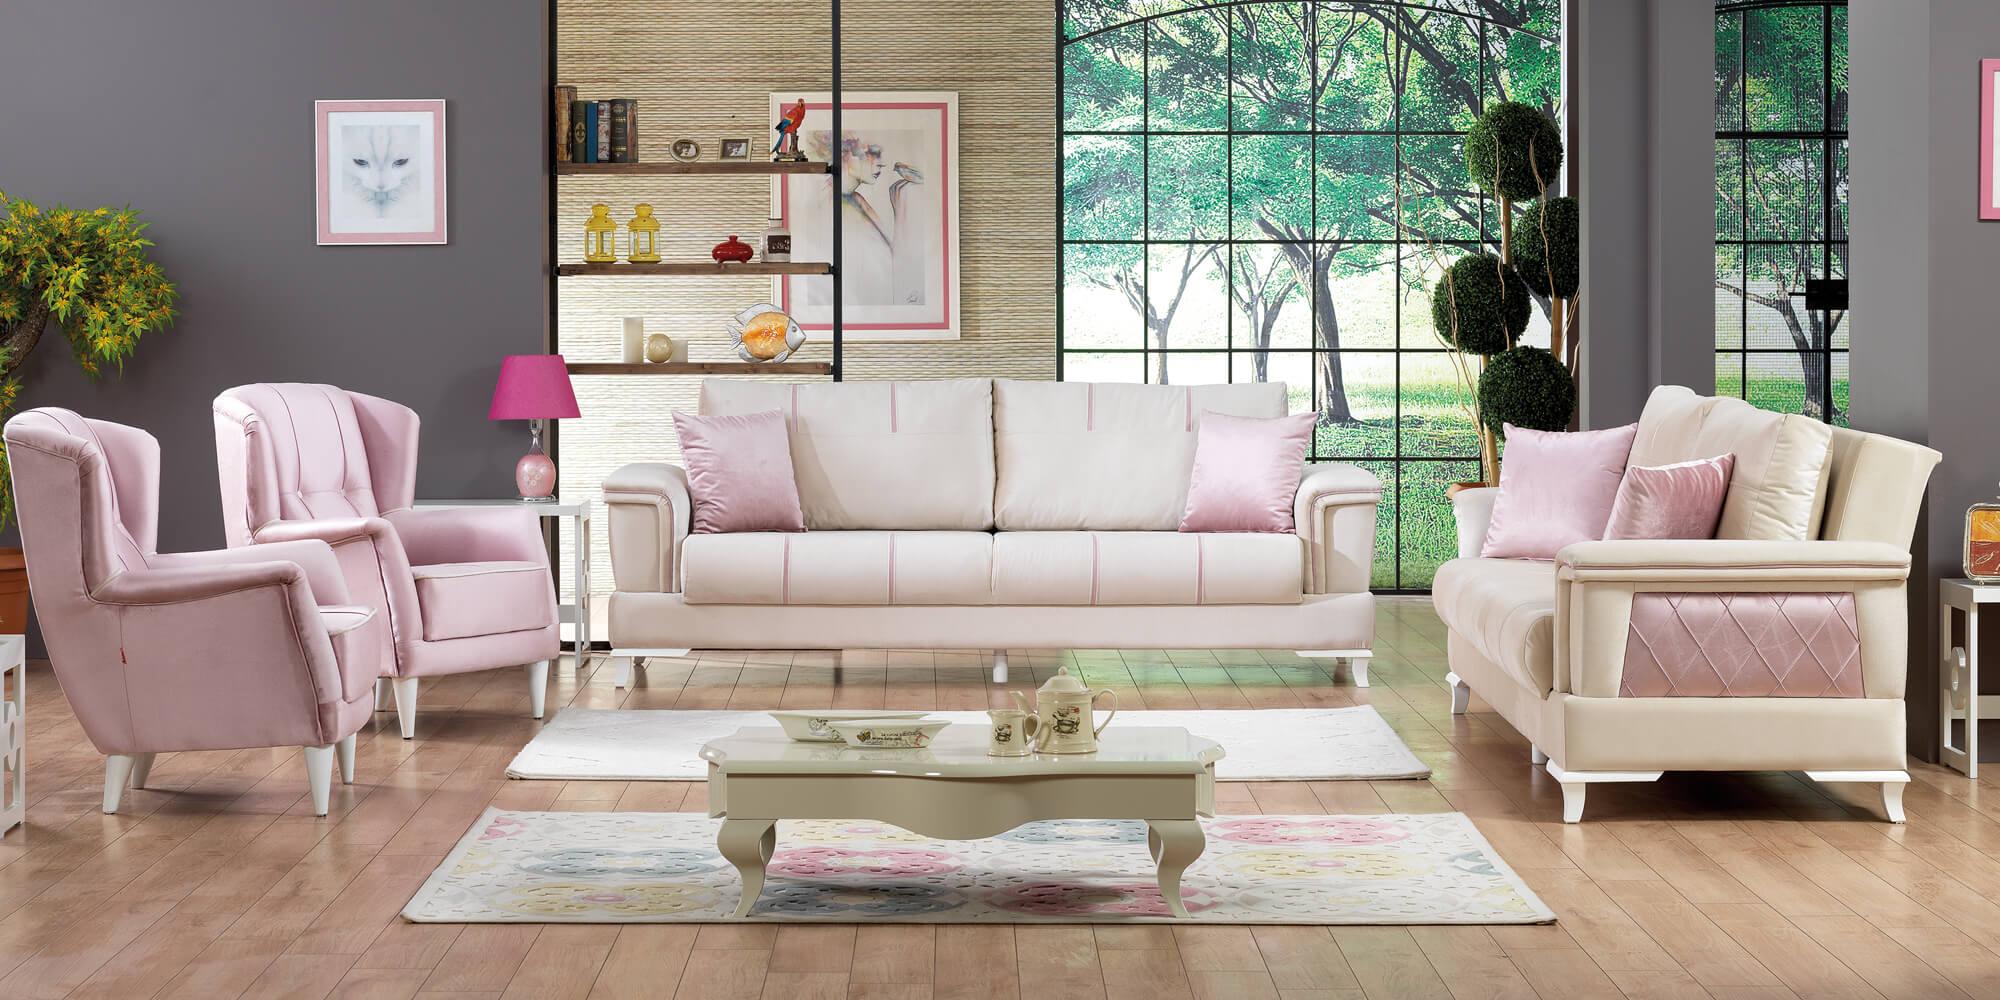 star 3 2 1 delux sofa set yuvam m belhaus in wuppertal cilek offizieller h ndler in europa. Black Bedroom Furniture Sets. Home Design Ideas